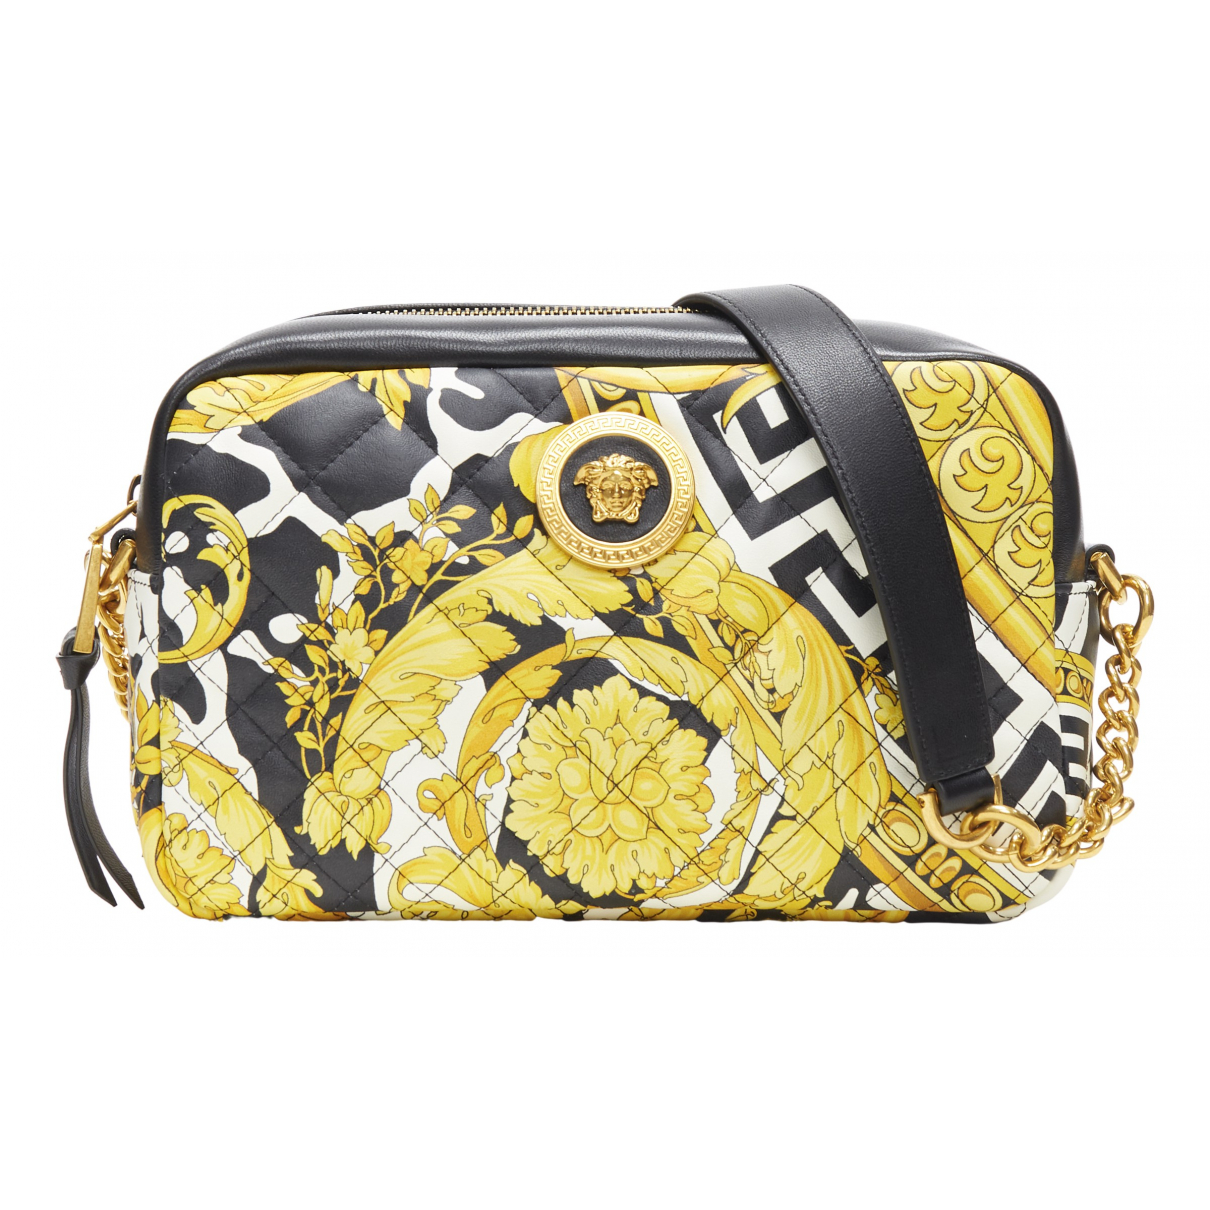 Versace \N Gold Cloth handbag for Women \N